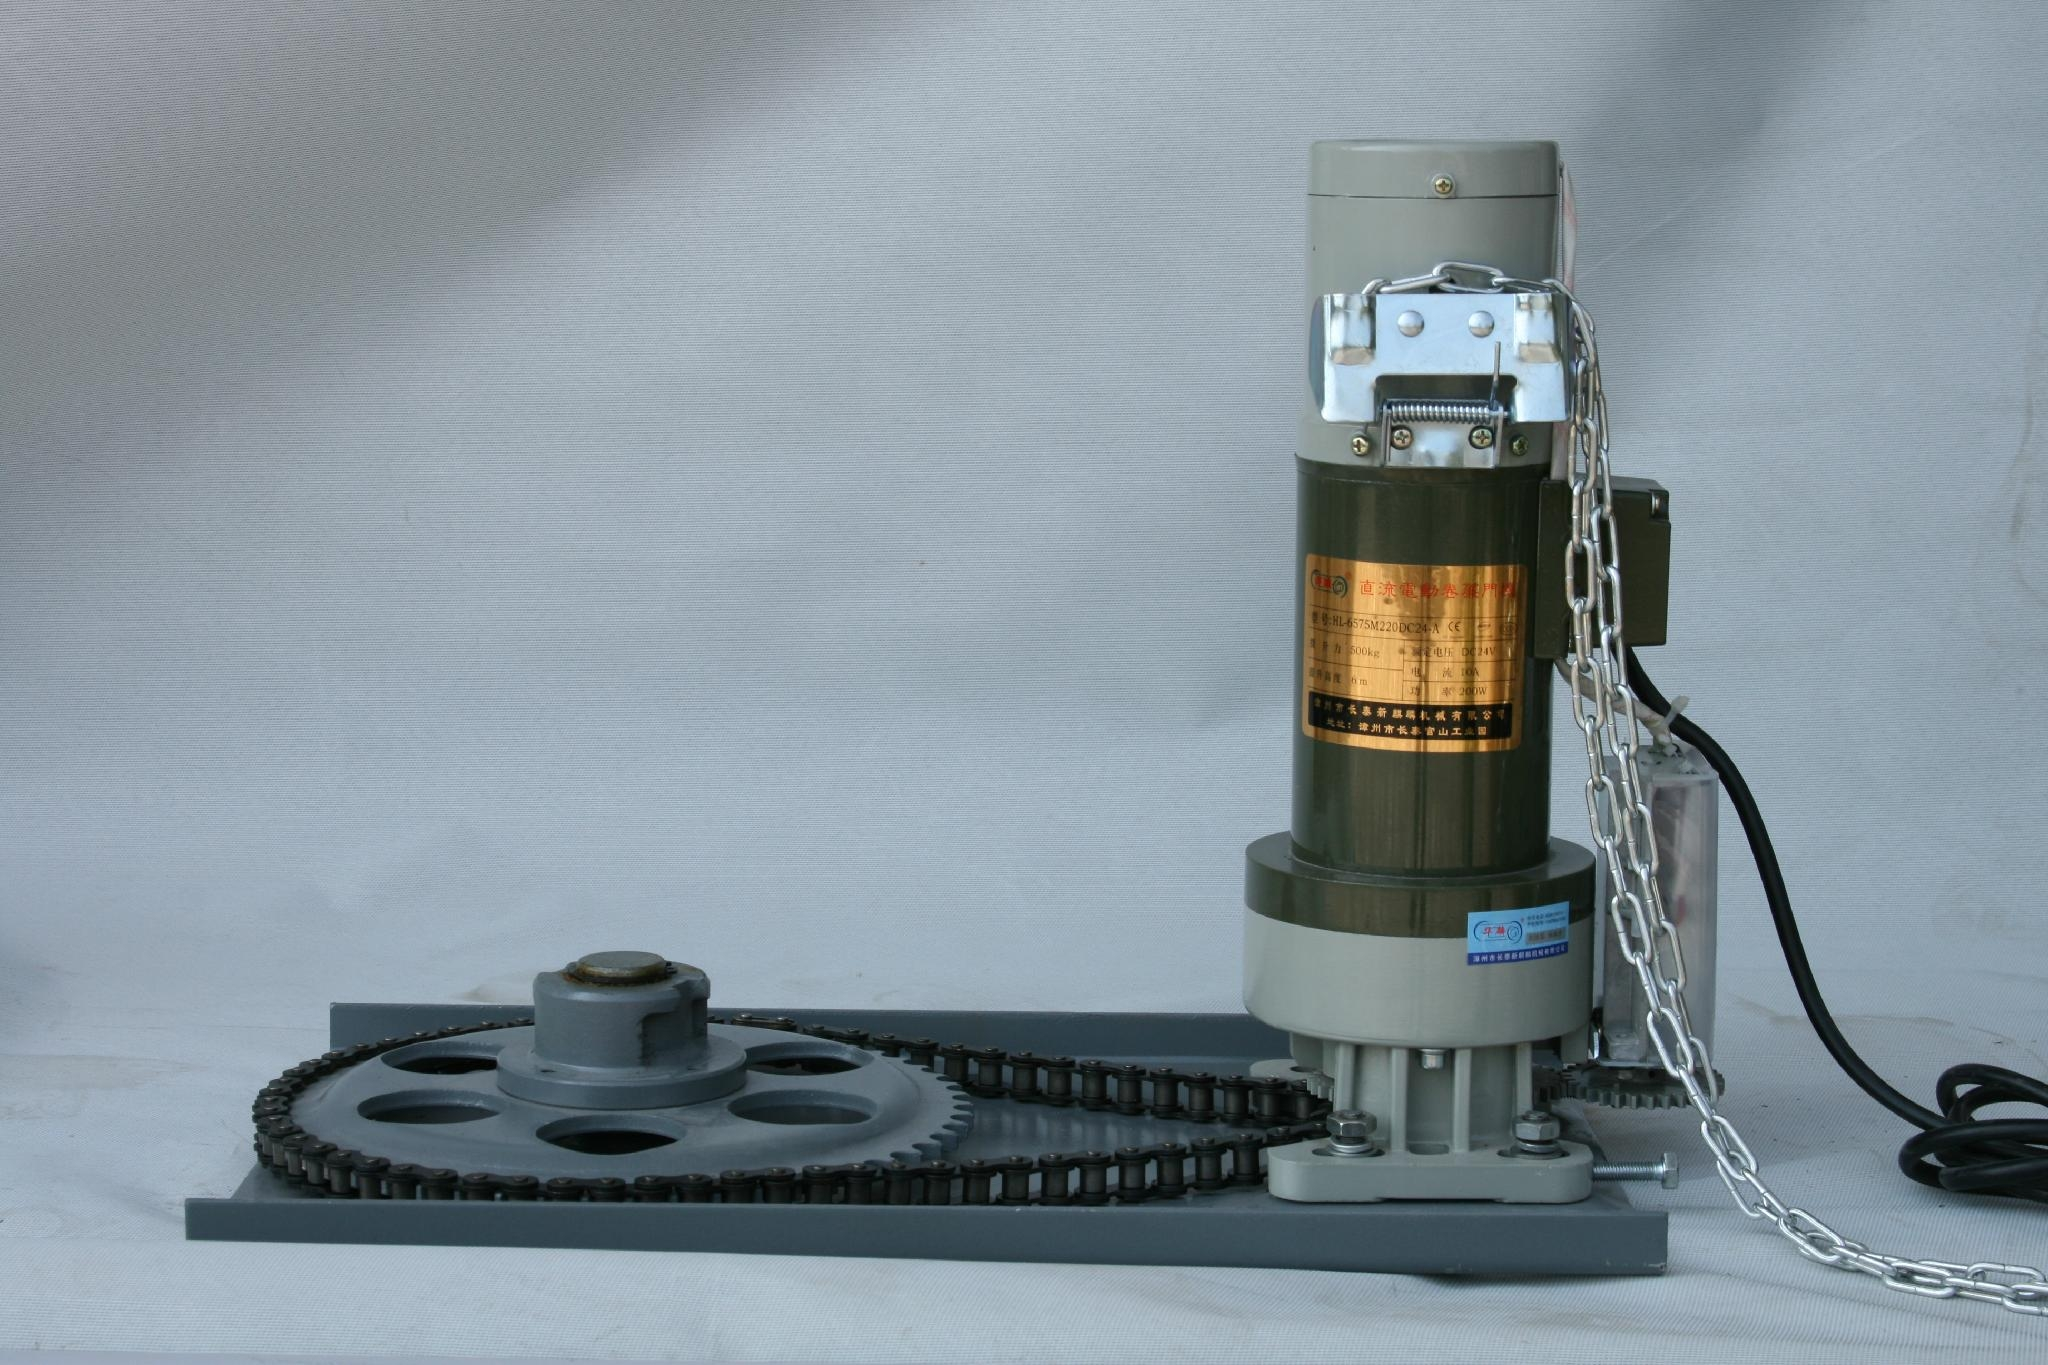 Roller door motor(DC24V-500KG motor) 1